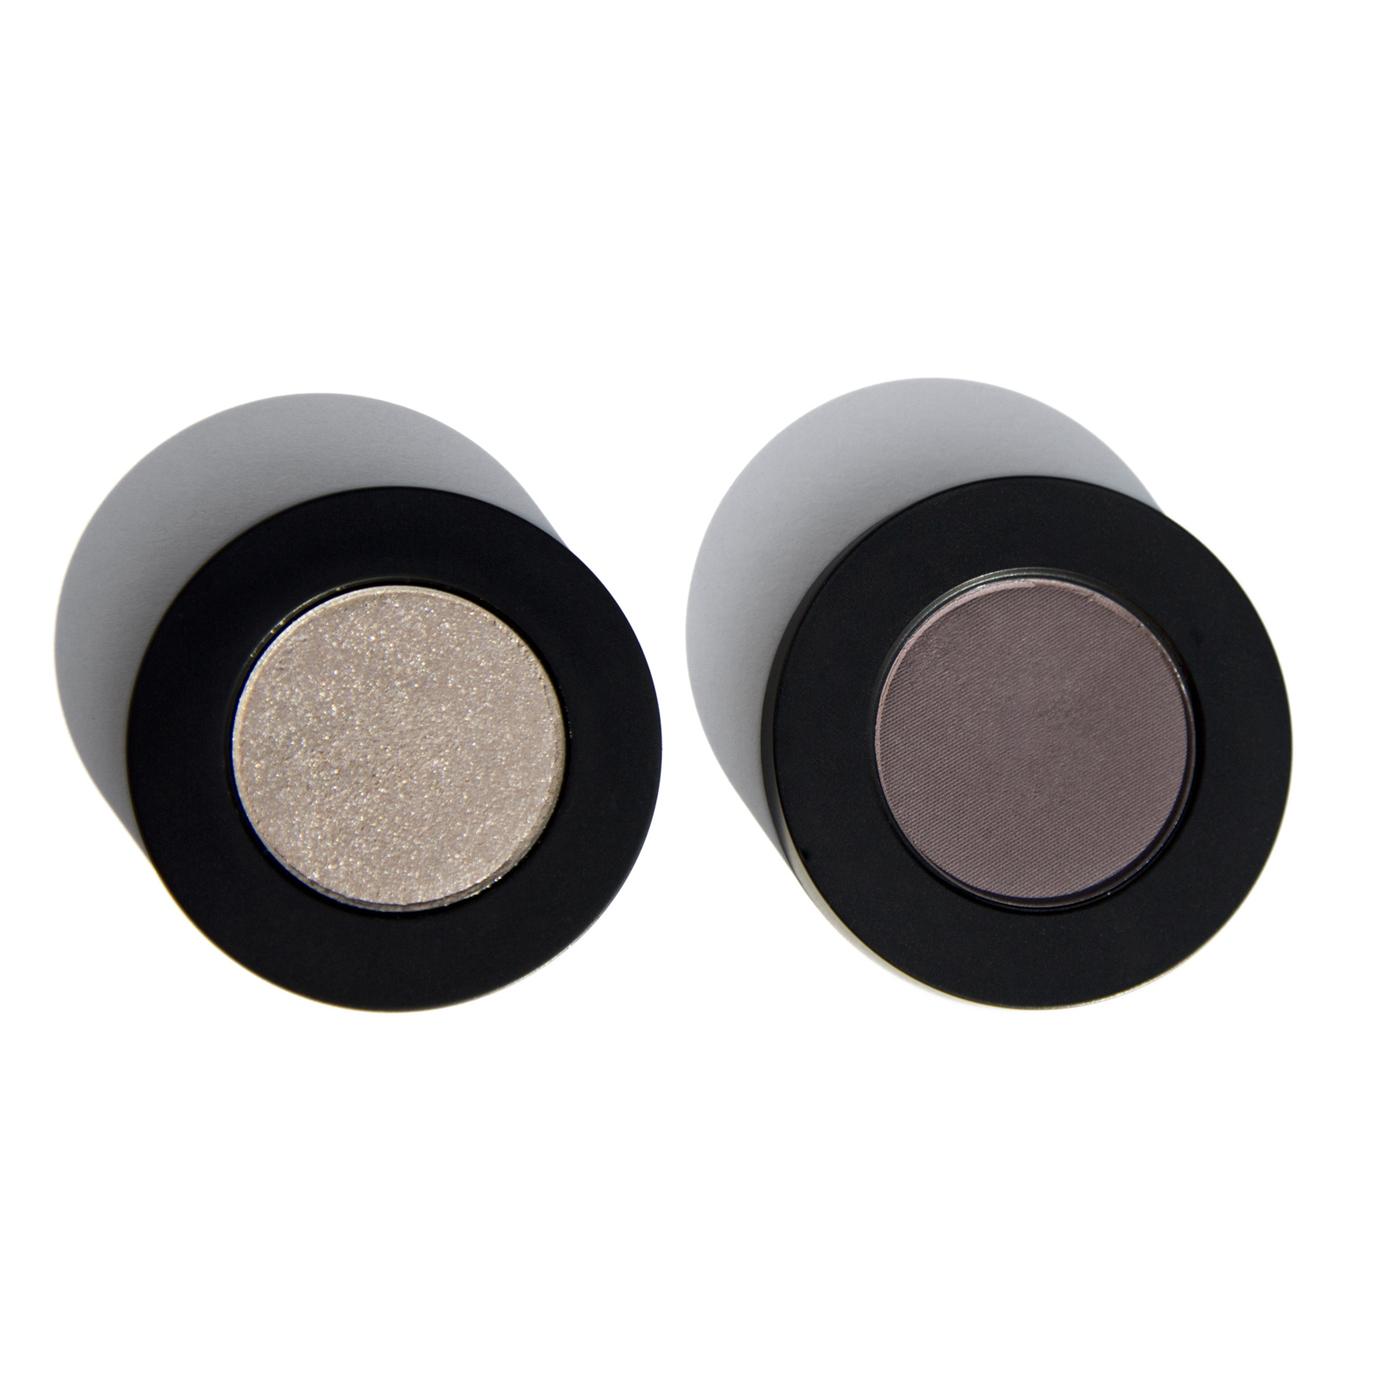 Melt Cosmetics Single Eyeshadows in Harsh Stone White & Assimilate